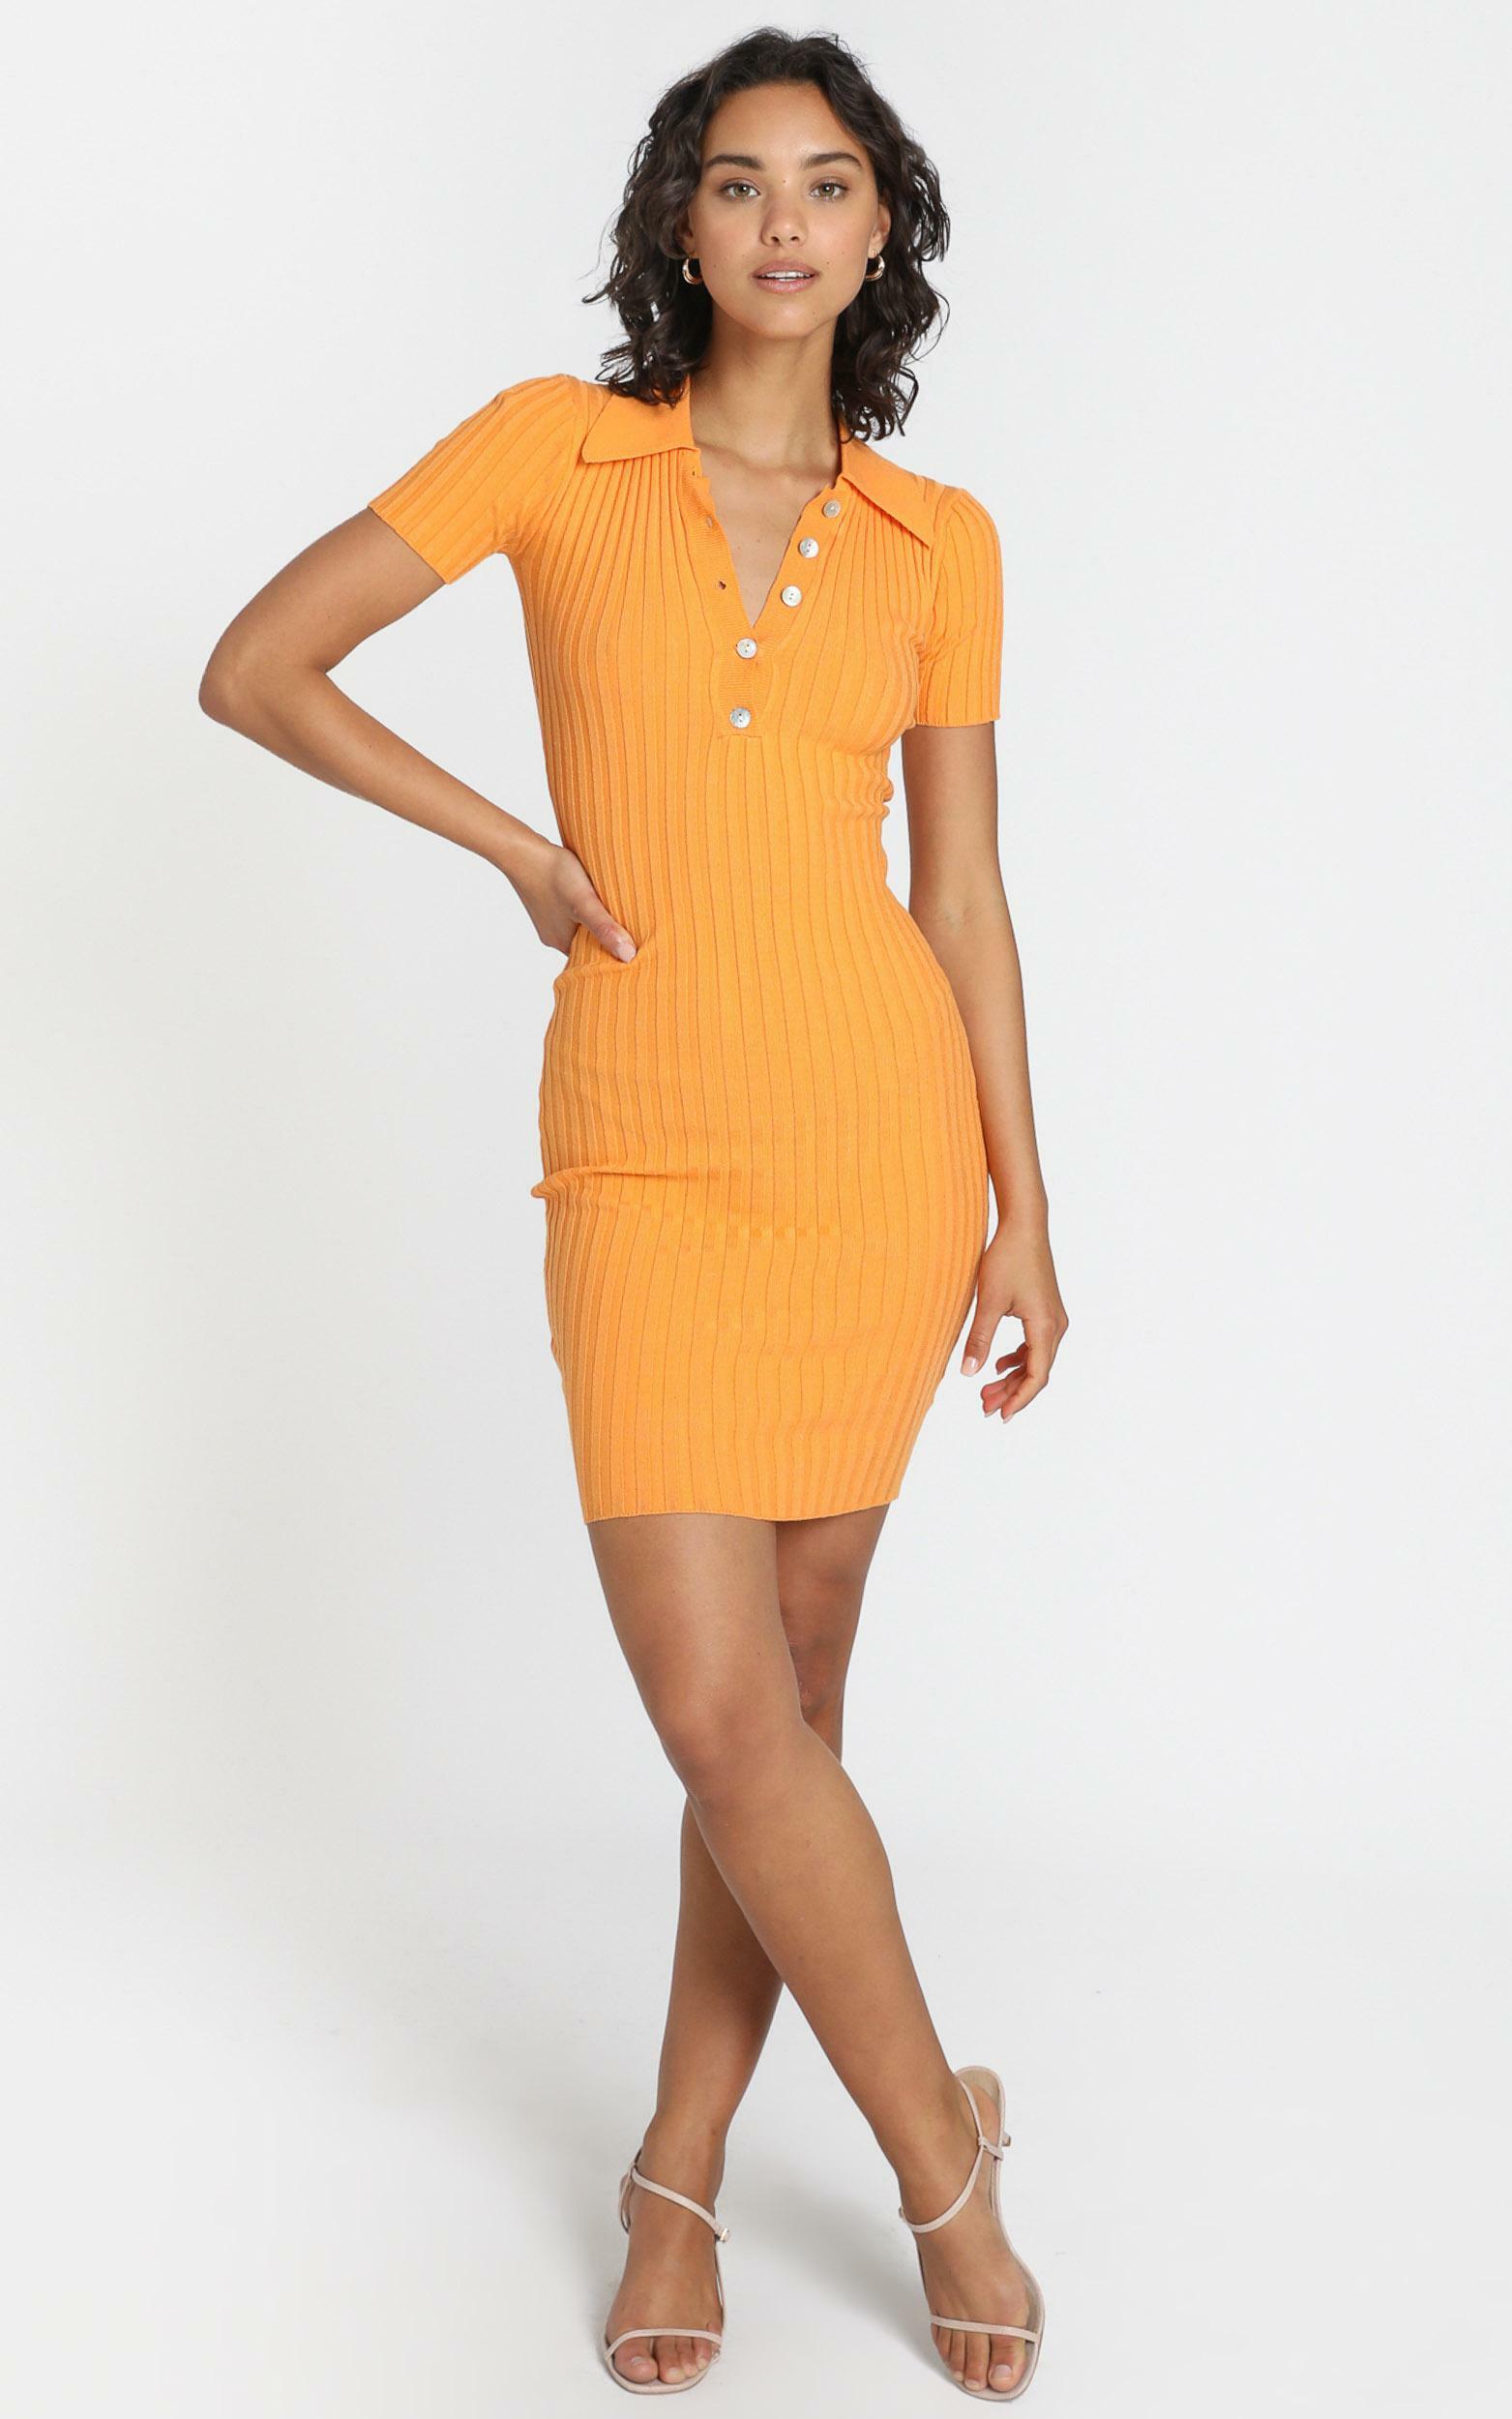 Callen Knit Dress In Mango - S/M, Orange, hi-res image number null